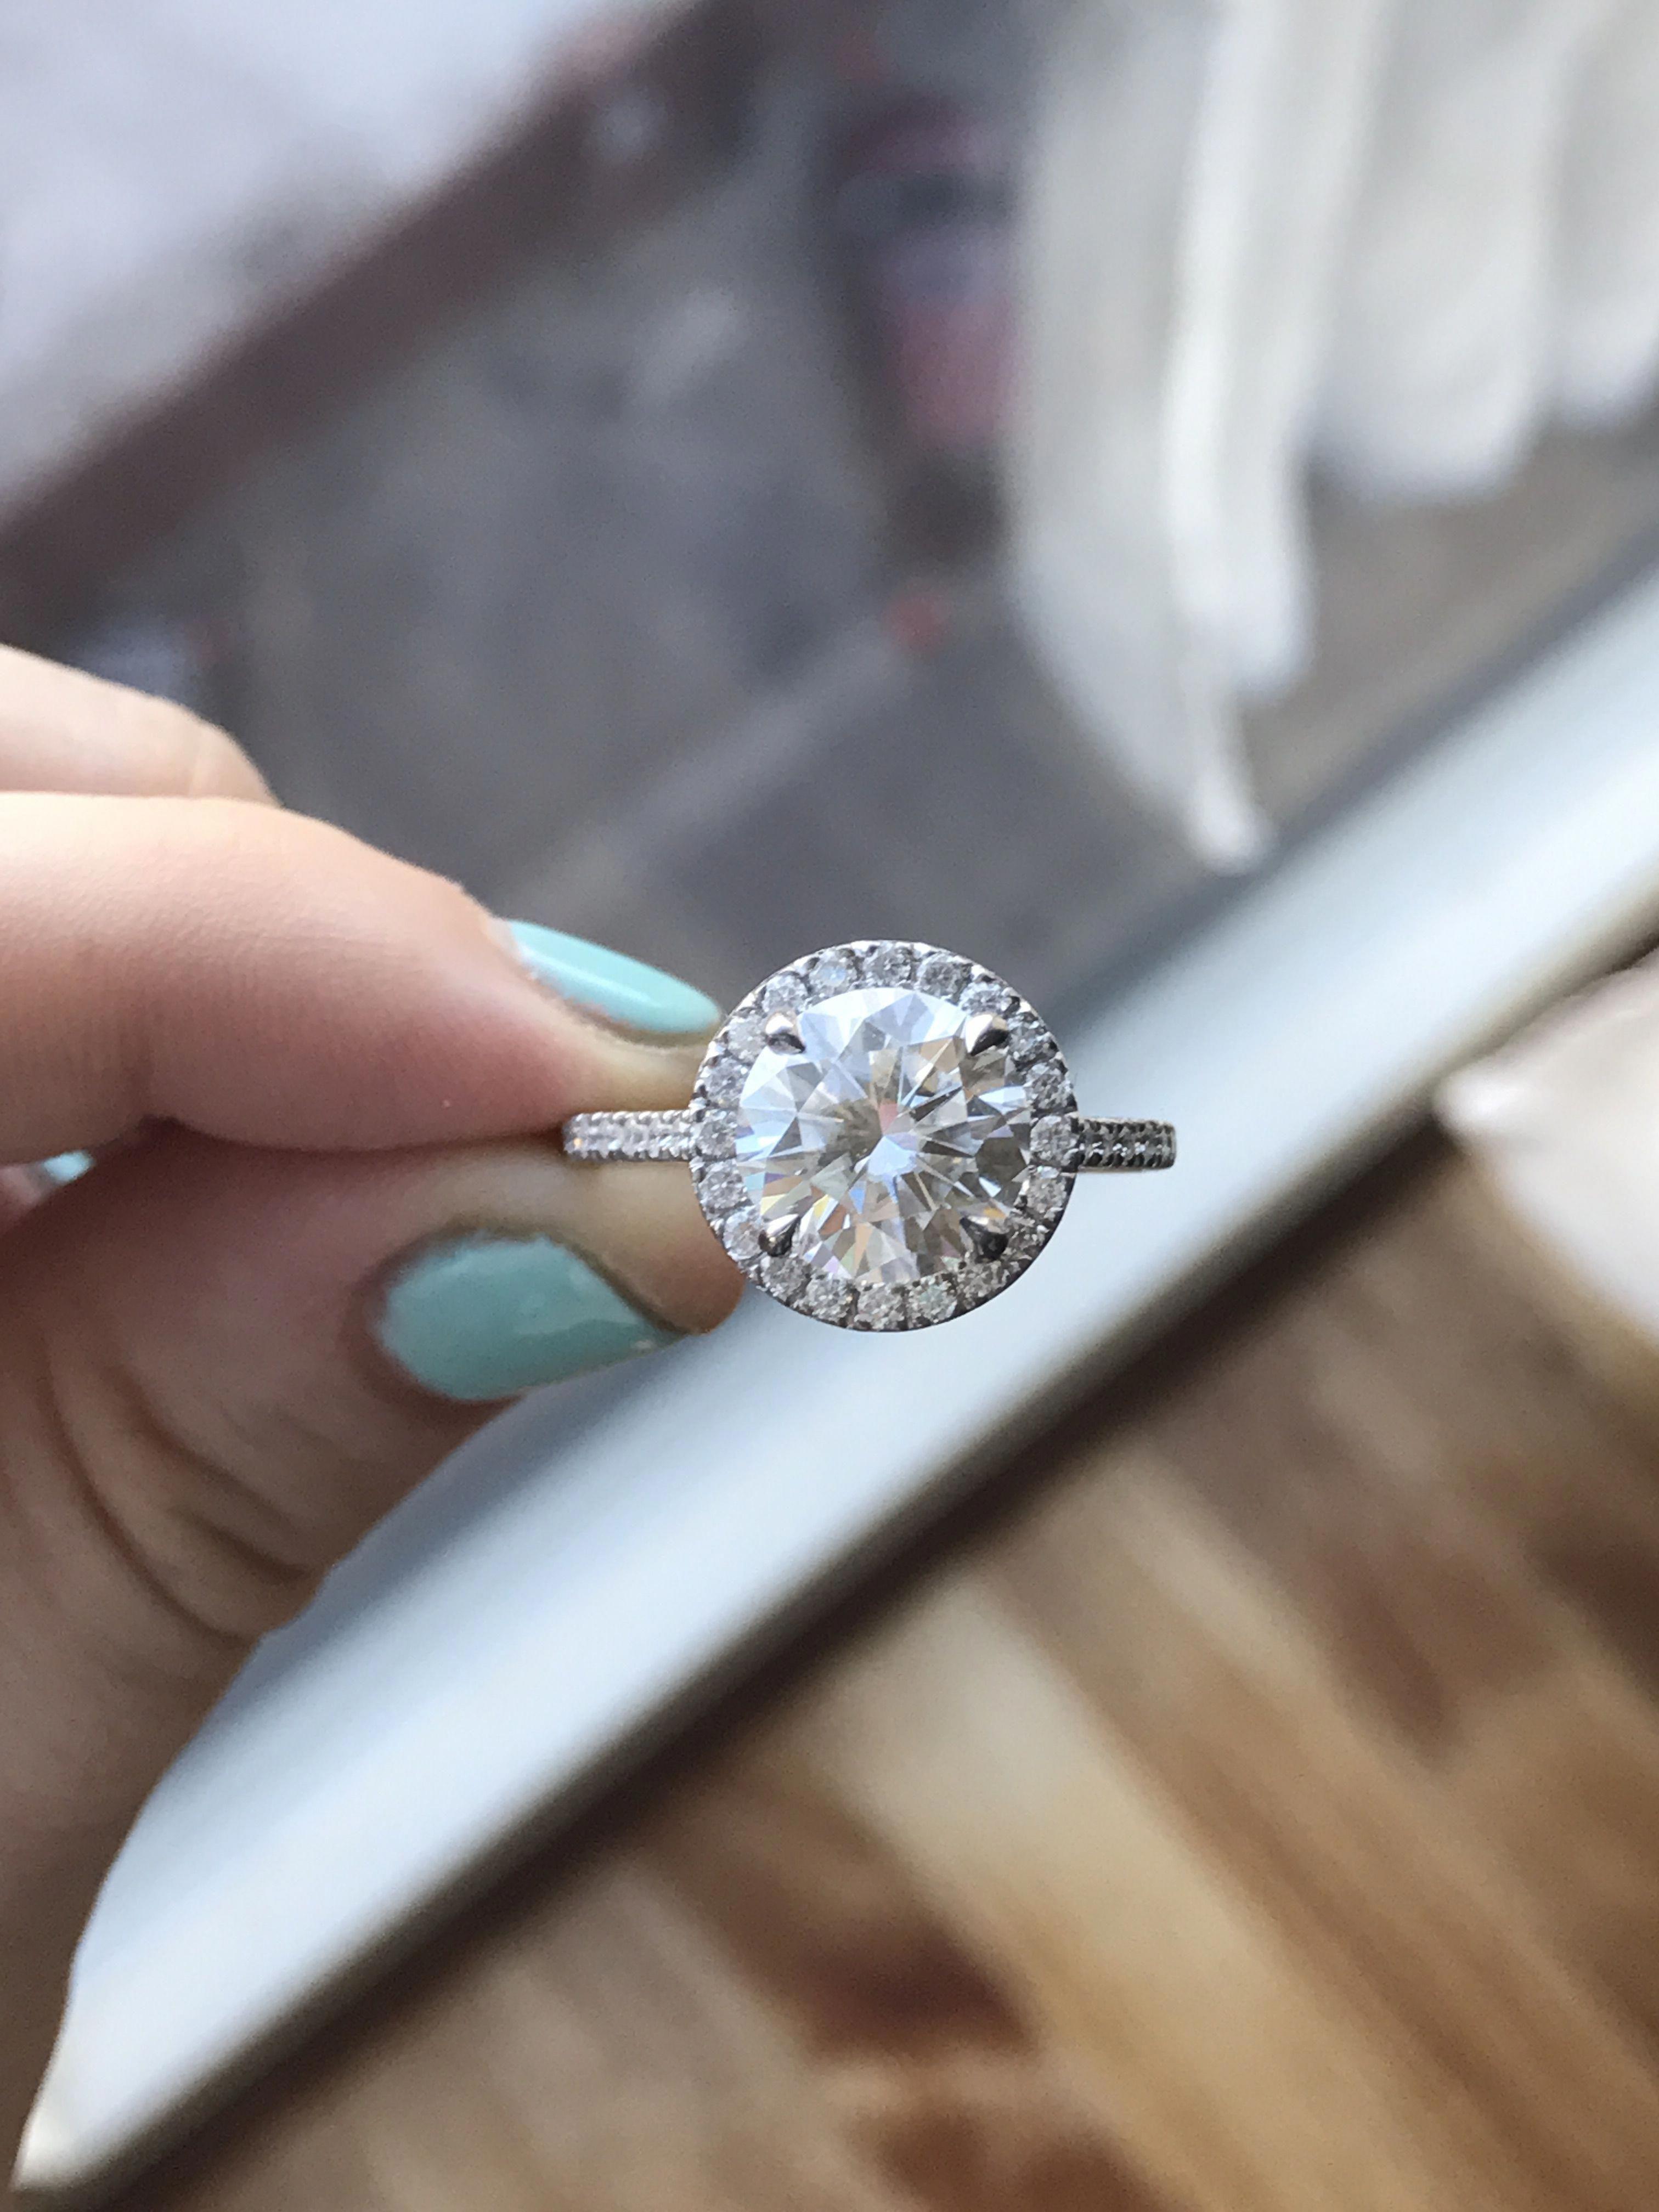 NEO moissanite Halo engagement ring. 4 carat center. White